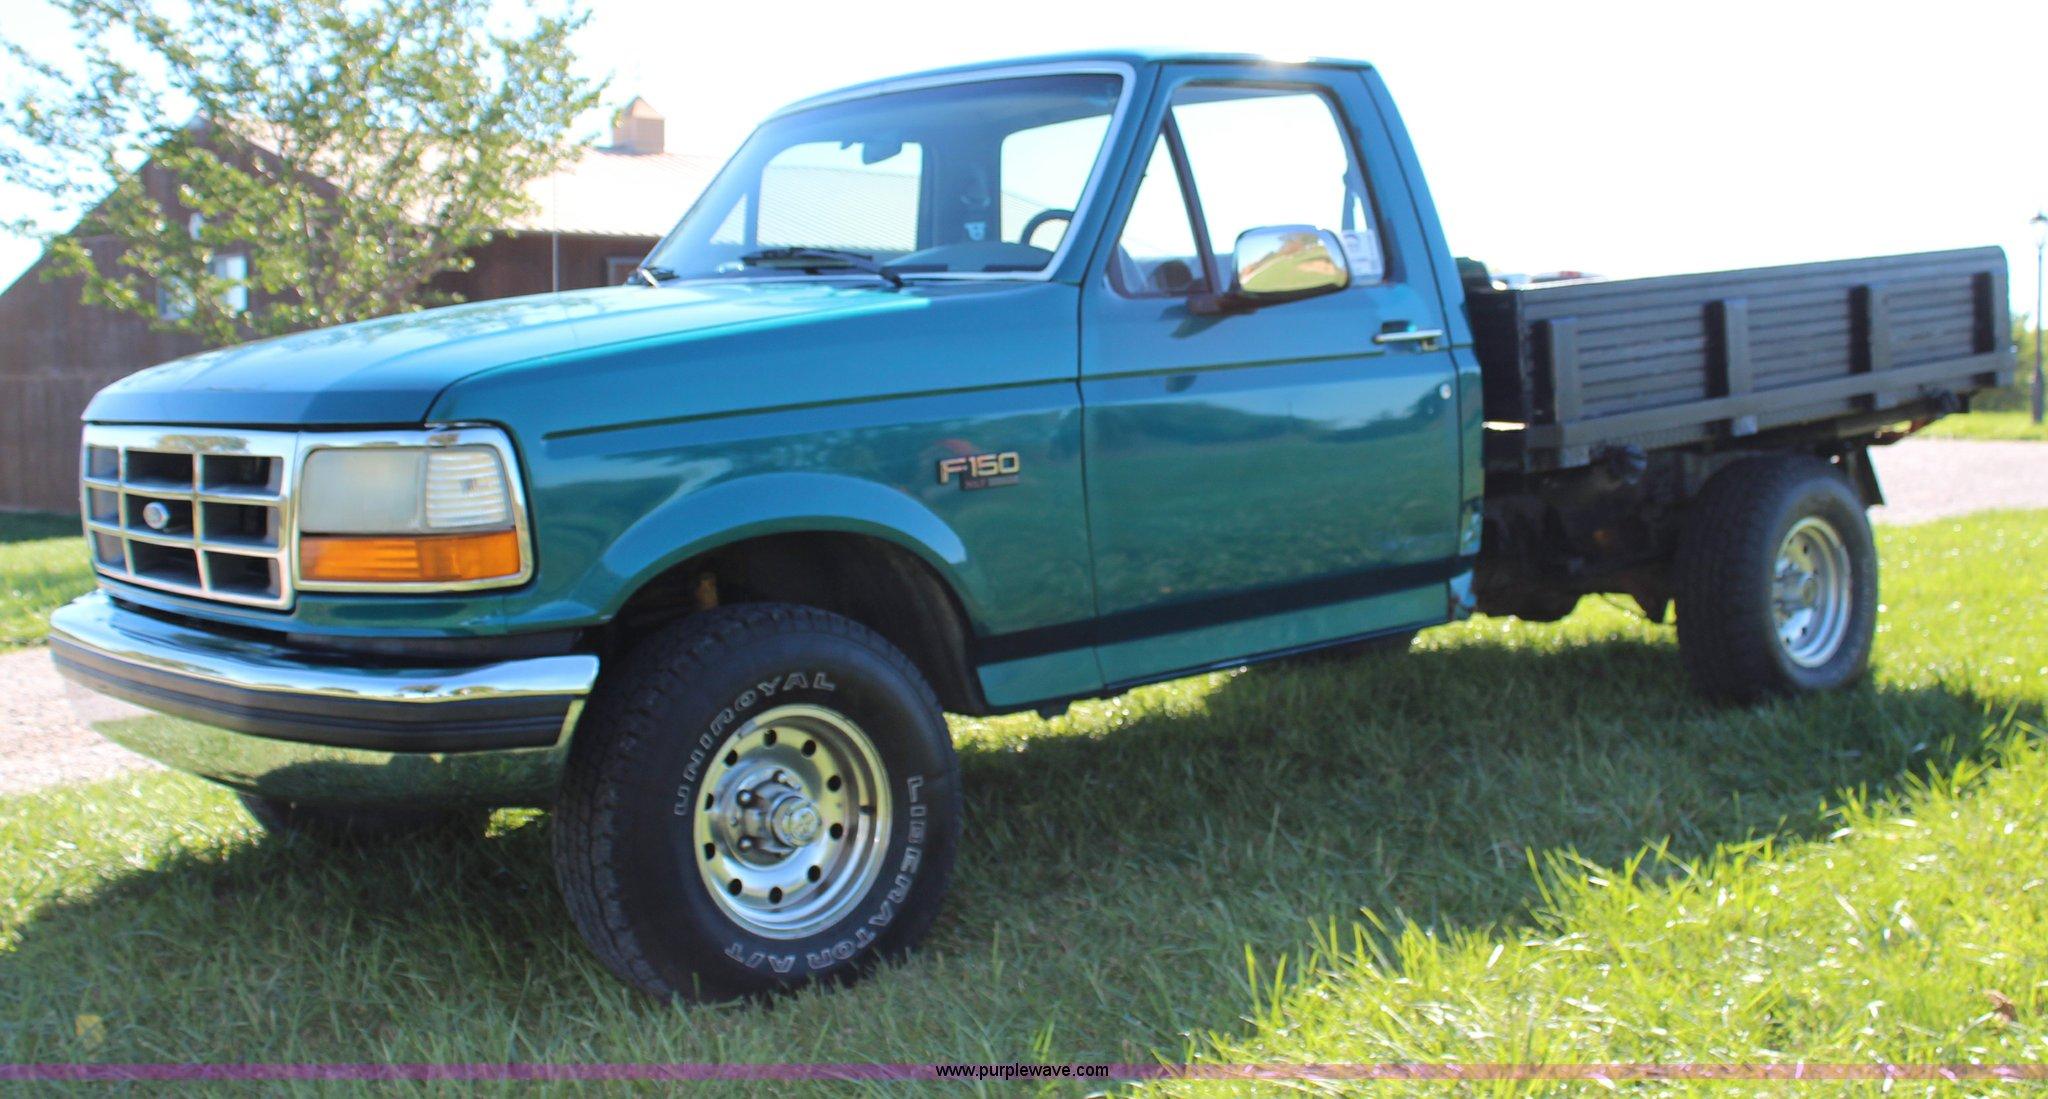 1994 Ford F150 Xlt Flatbed Pickup Truck Item H6790 Sold